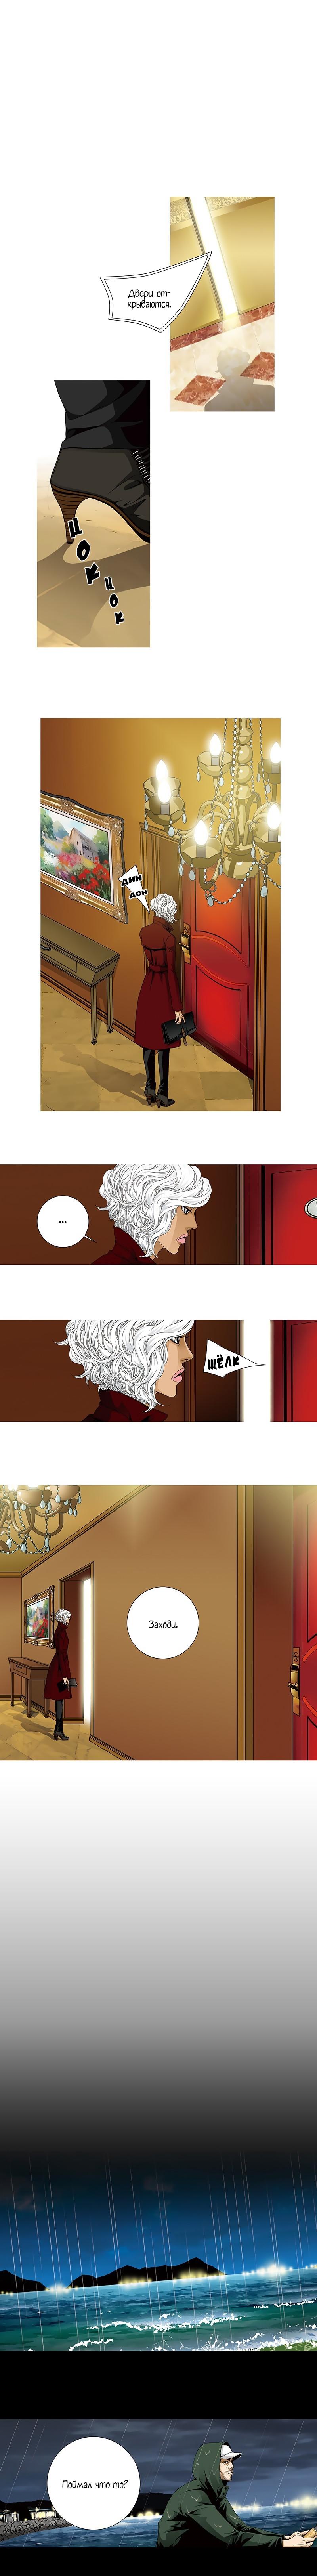 https://r1.ninemanga.com/comics/pic2/29/28573/344345/1512078927784.jpg Page 2